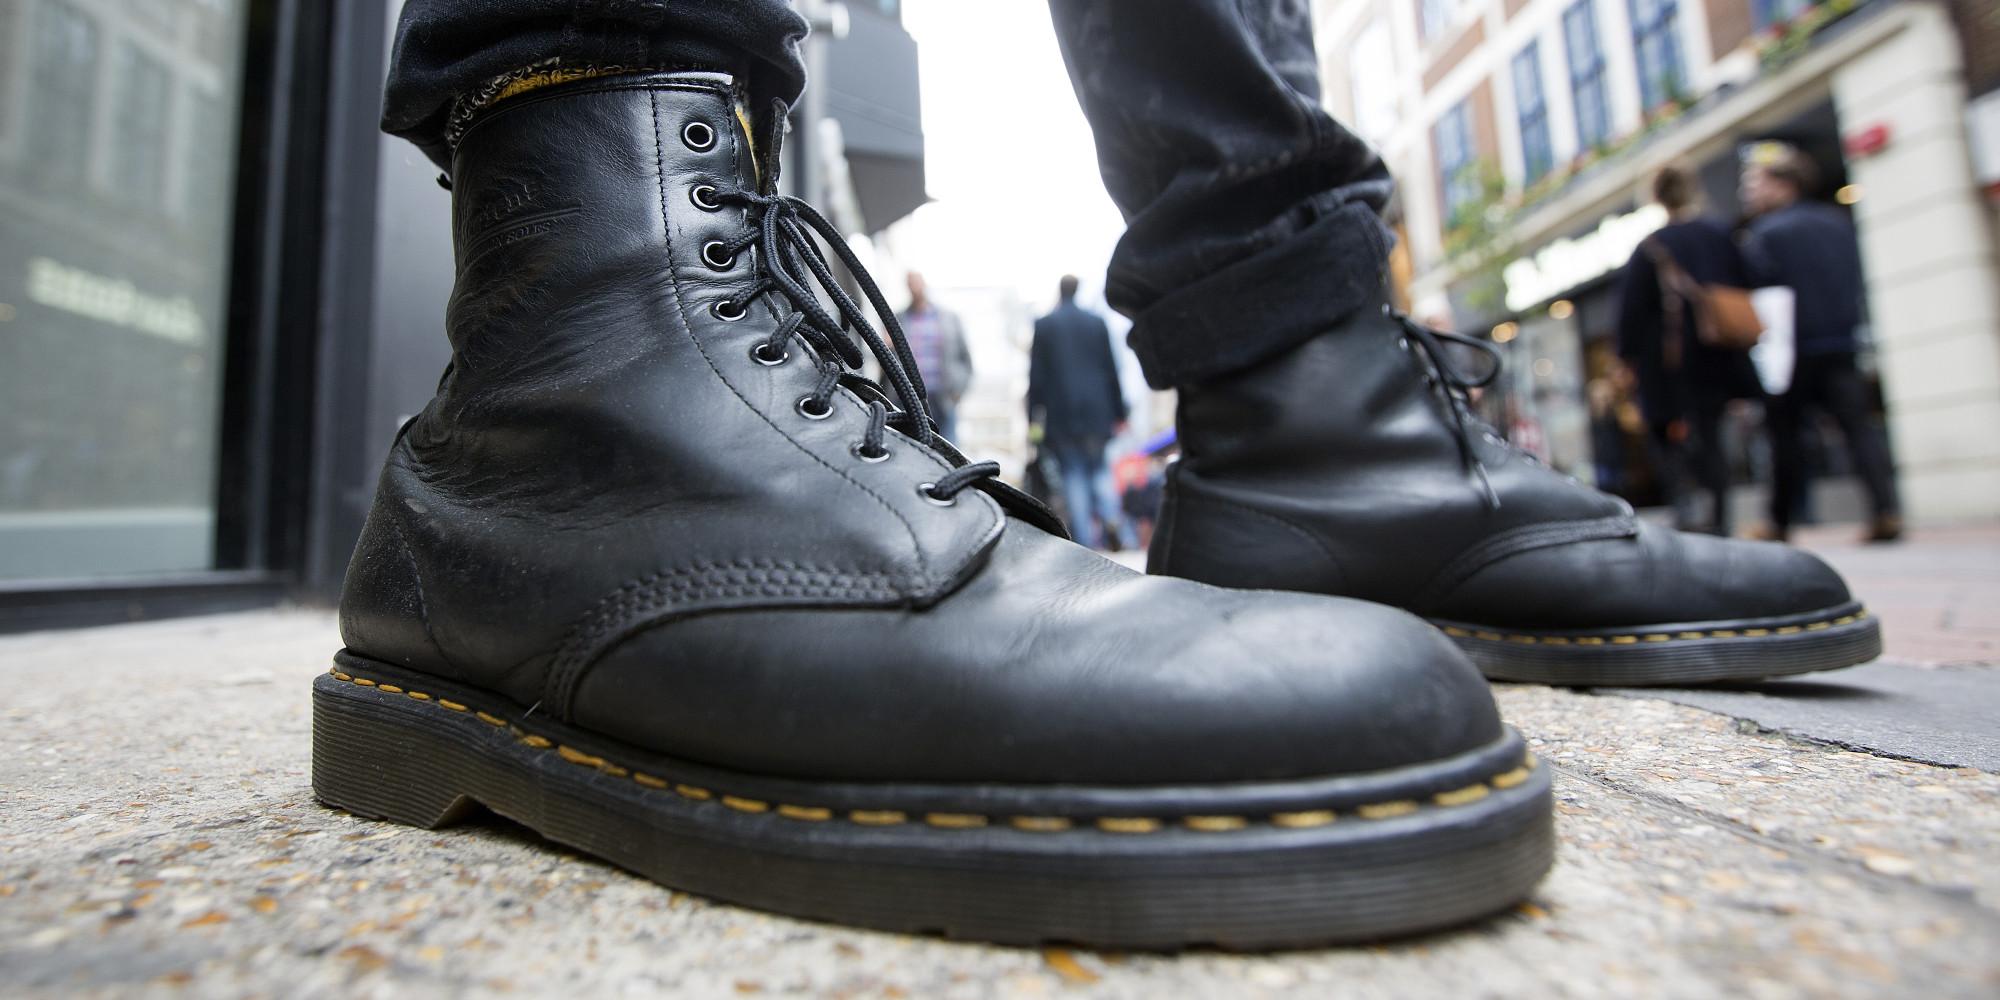 dr martens sold iconic punk boot maker bought by investors. Black Bedroom Furniture Sets. Home Design Ideas